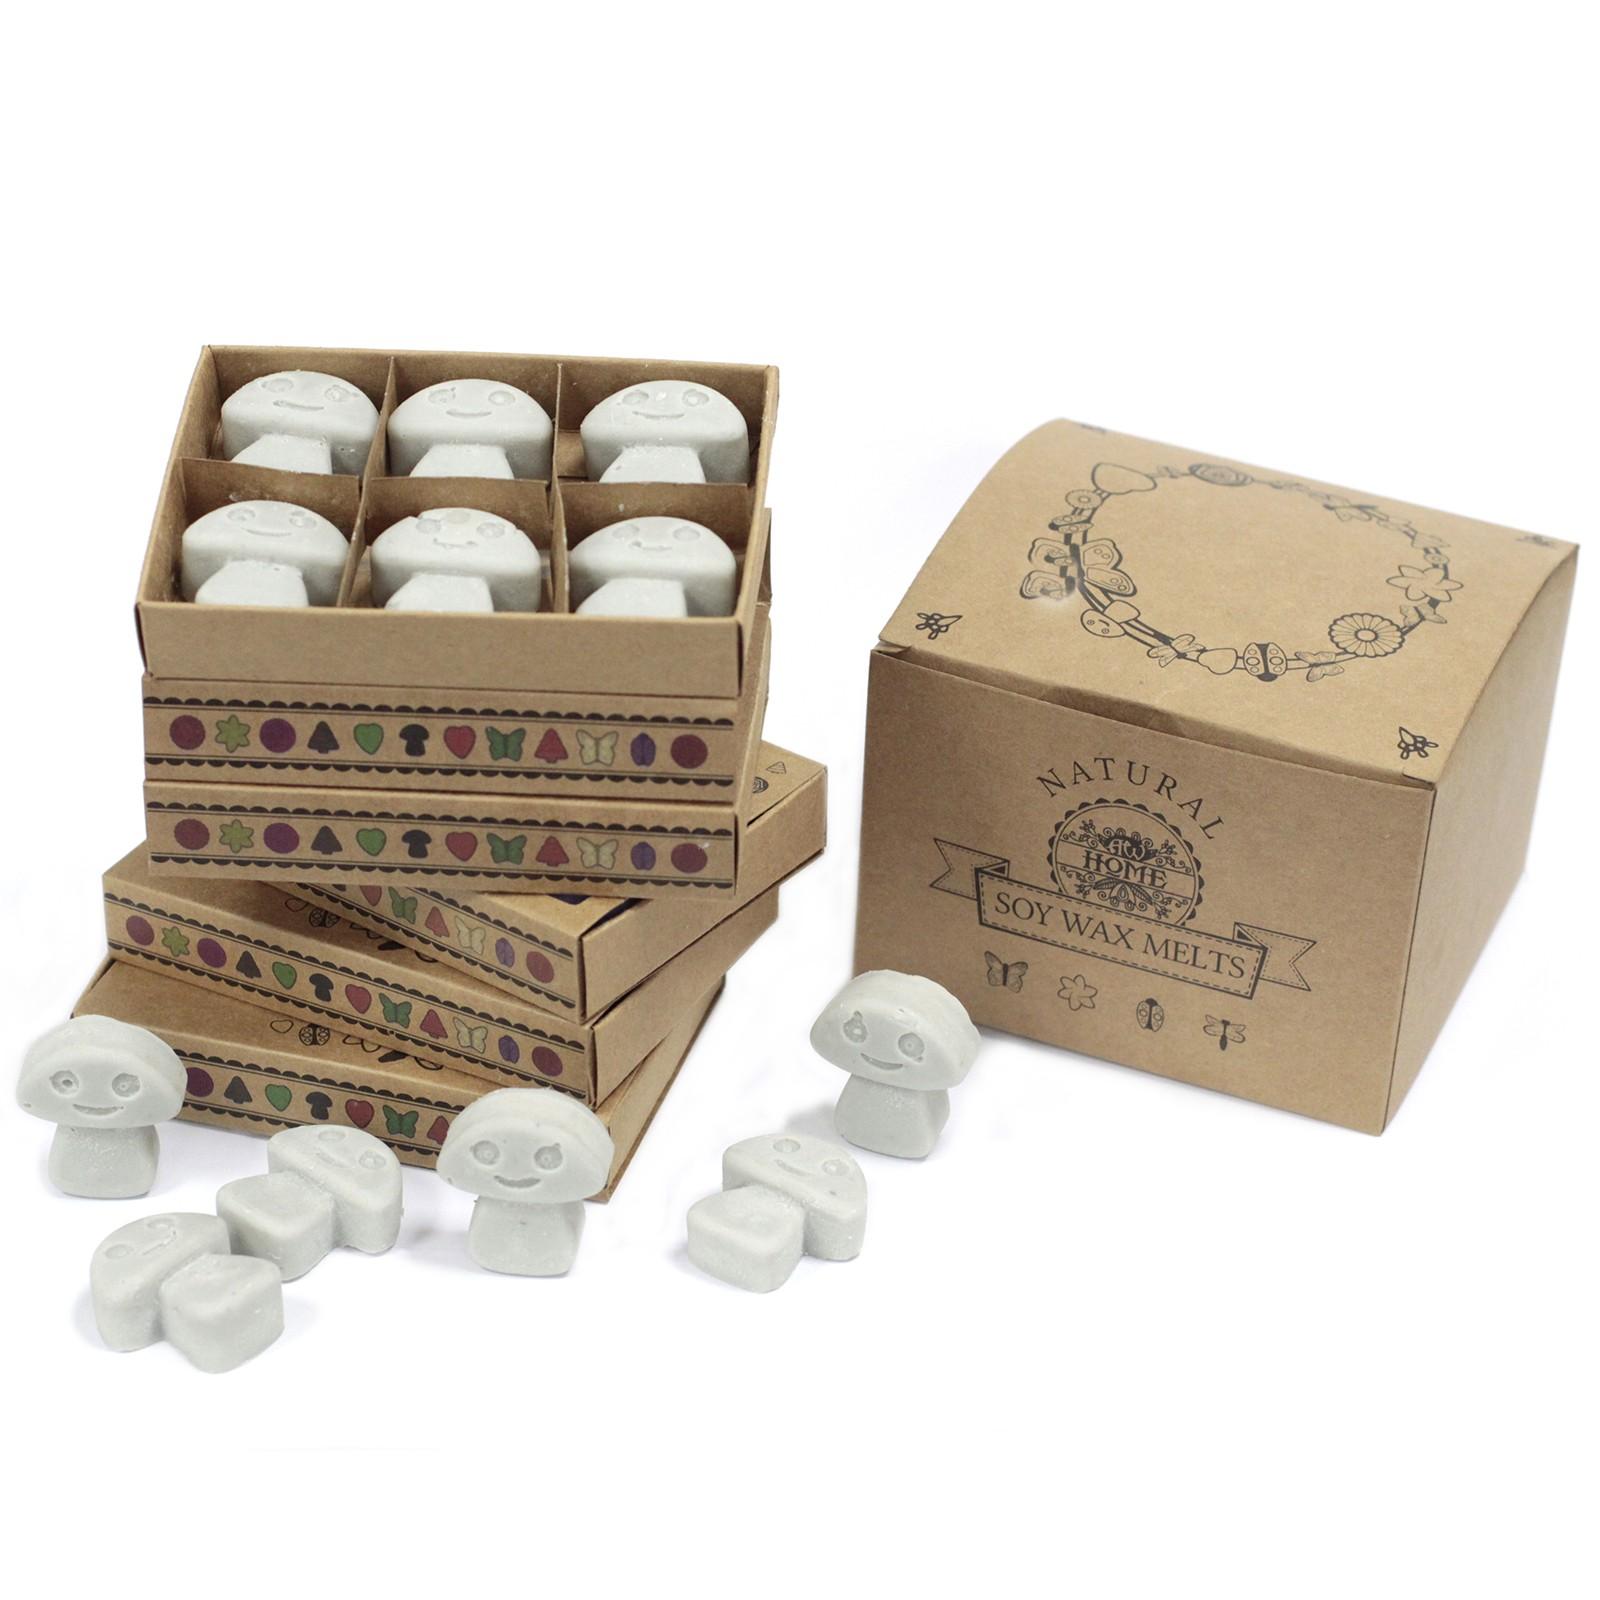 Box of 6 Wax Melts Dark Patchouli